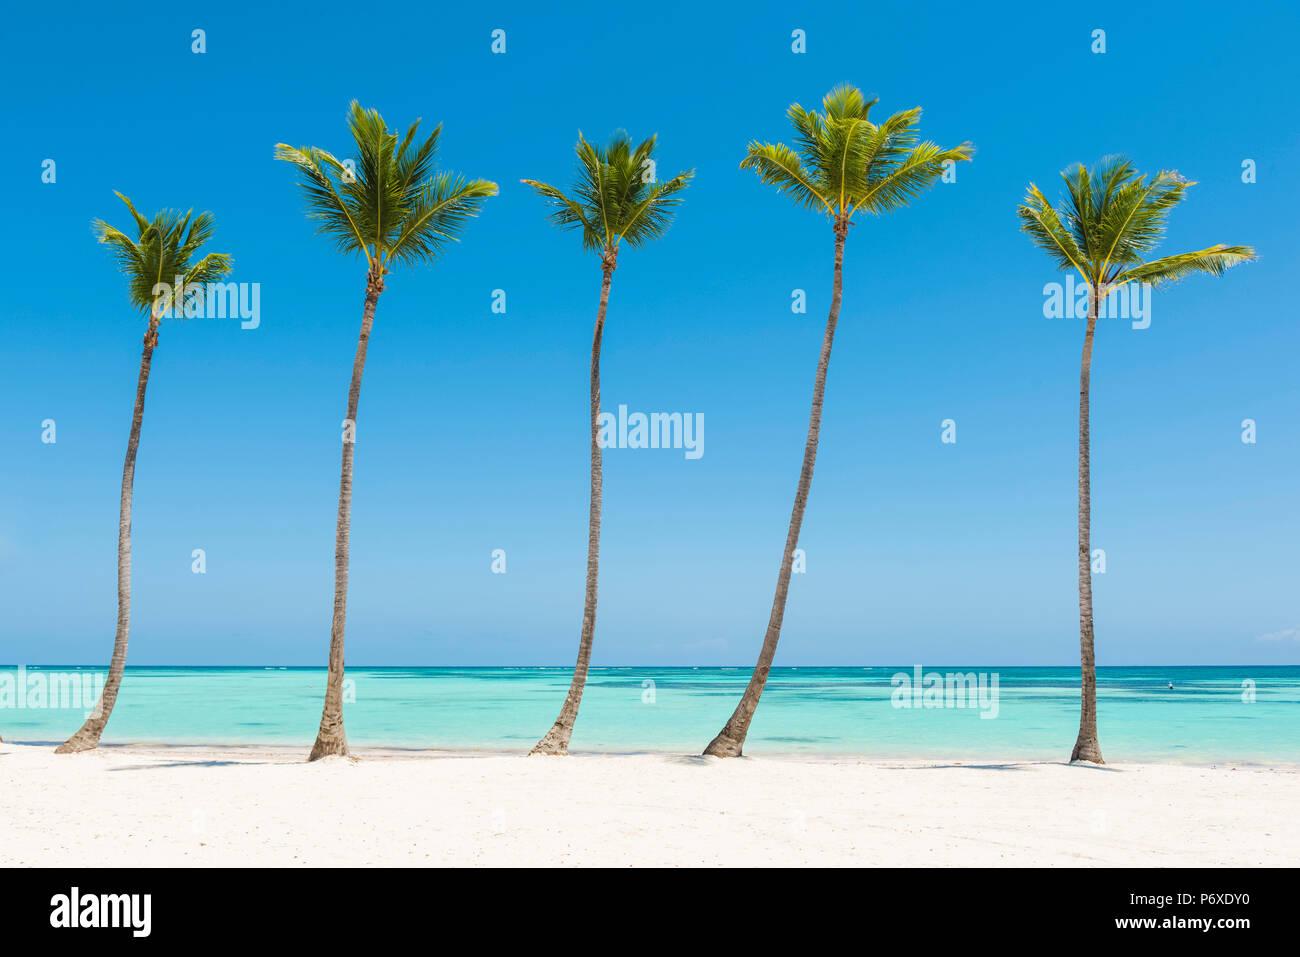 Juanillo Beach (playa Juanillo), Punta Cana, Dominican Republic. Palm-fringed beach. - Stock Image